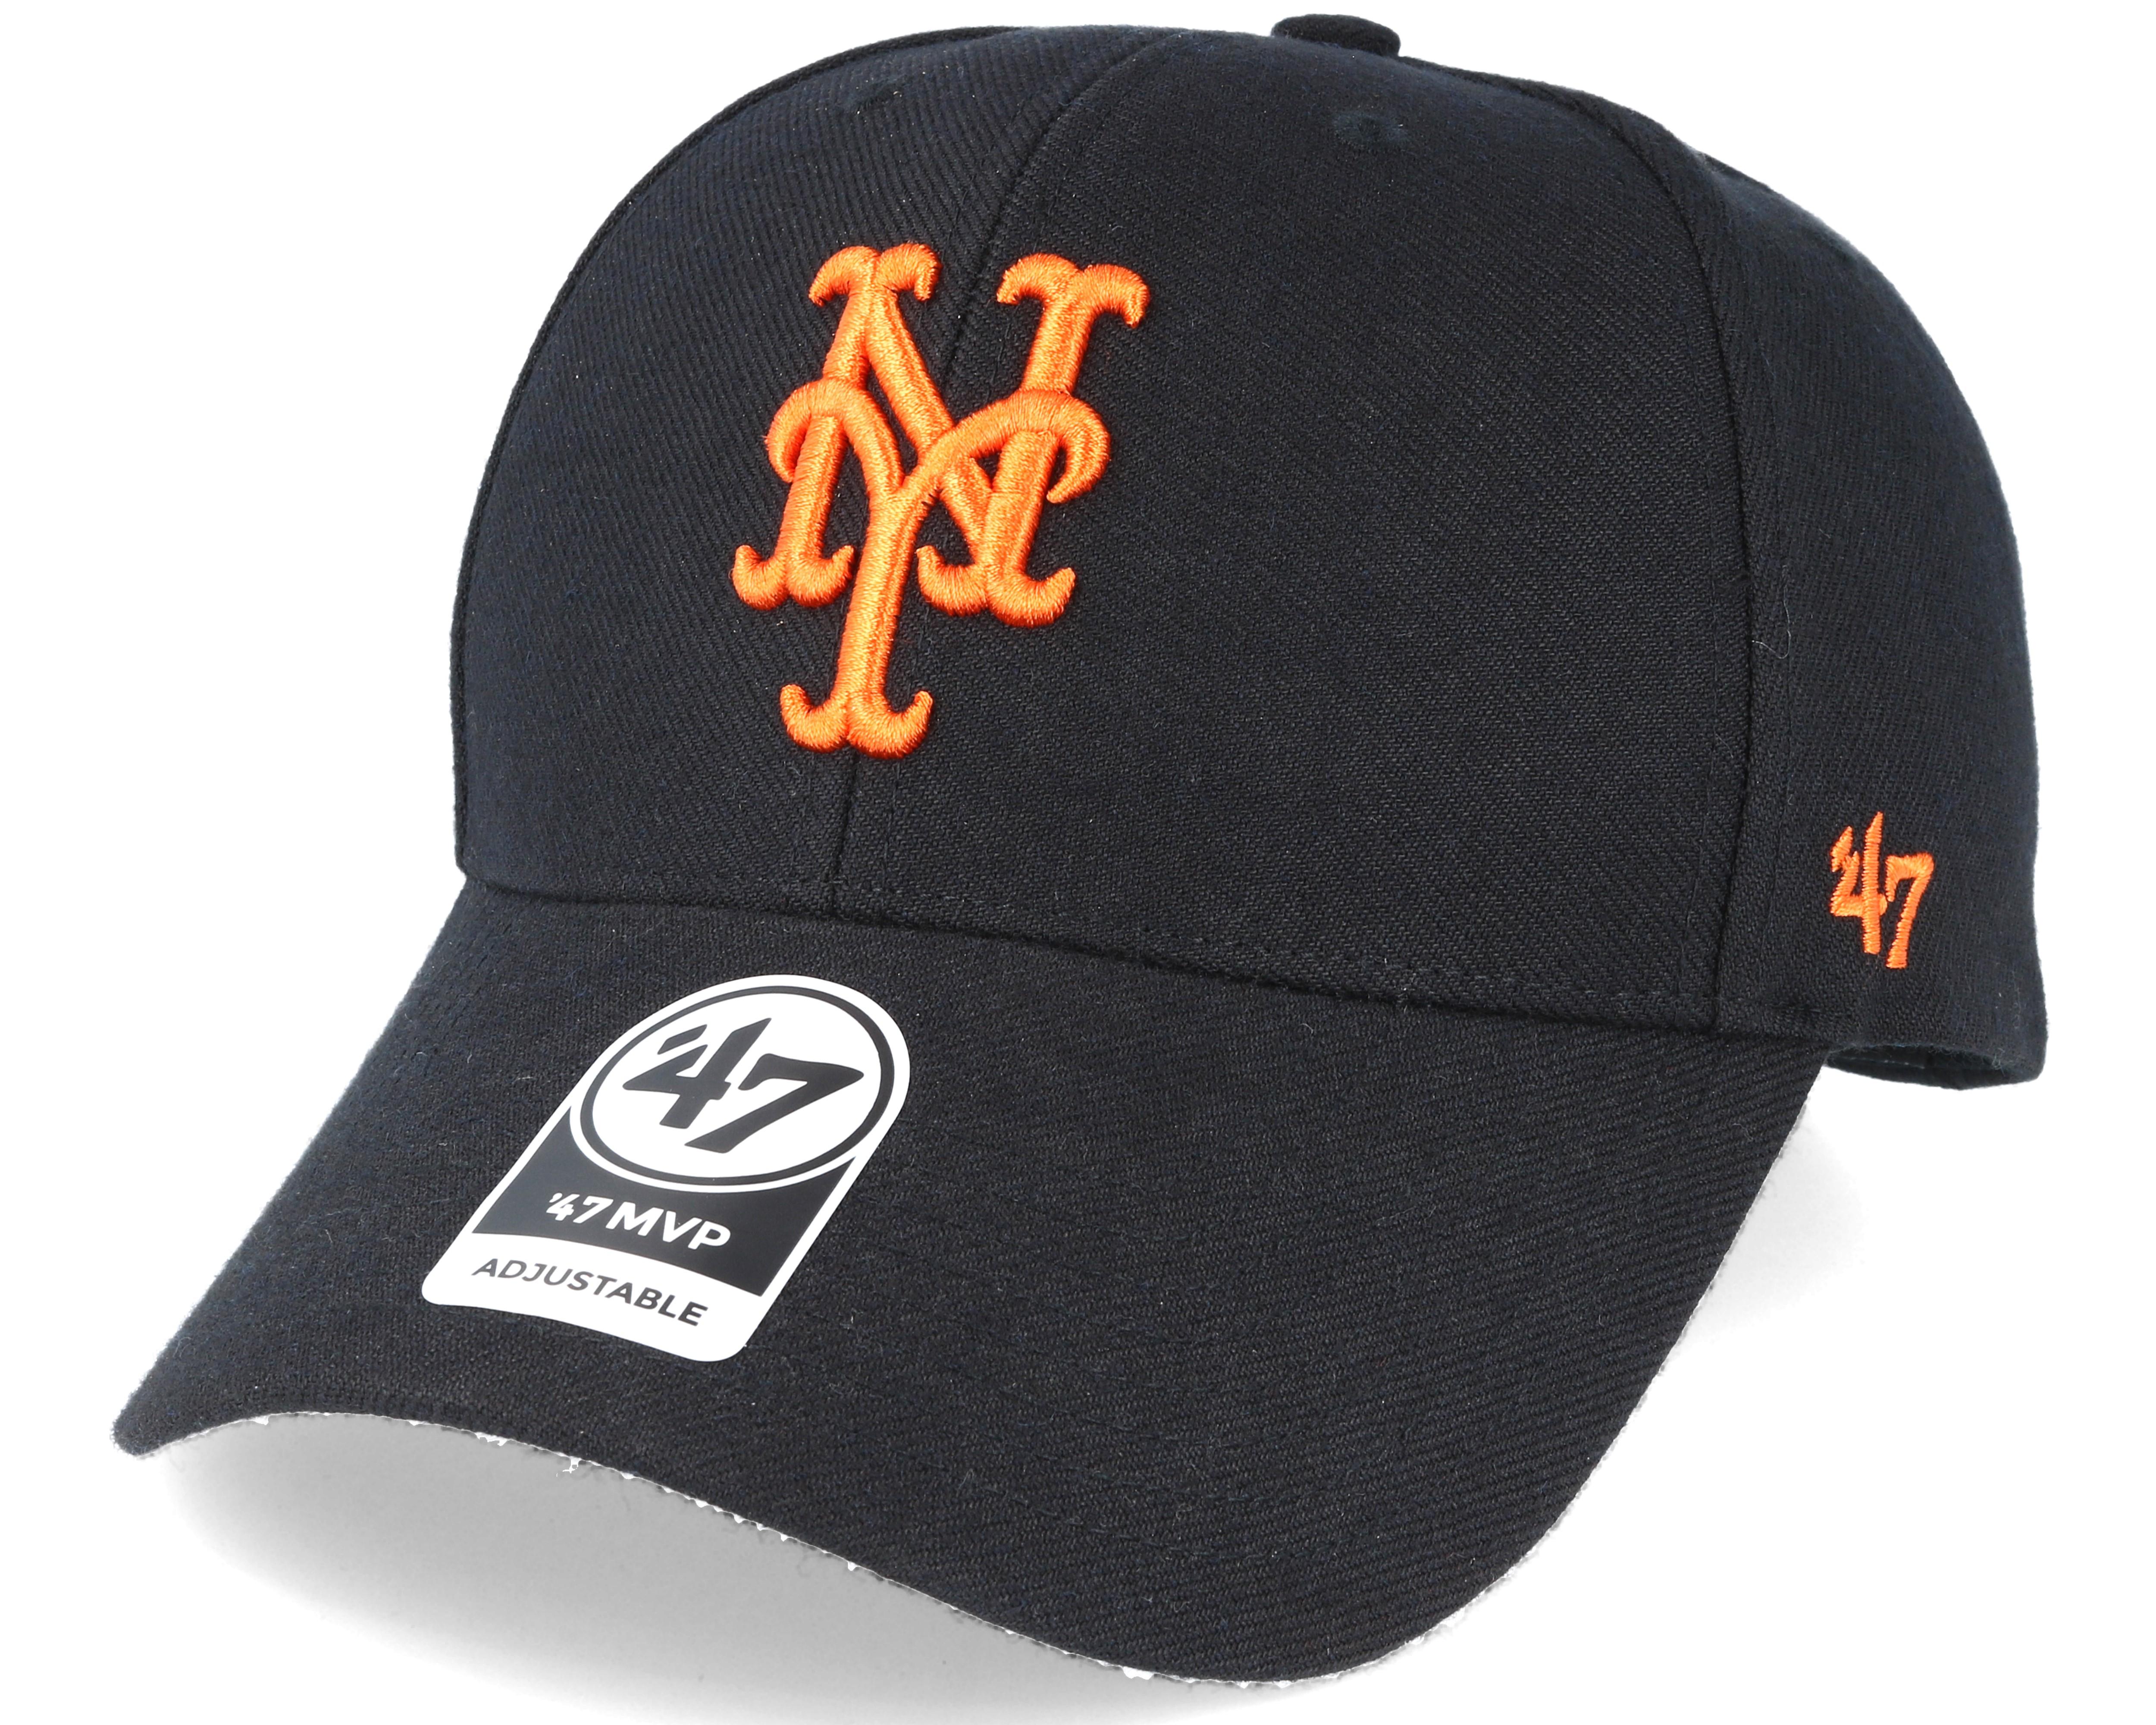 New York Mets Mvp Black Adjustable - 47 Brand caps  c87ab038b87